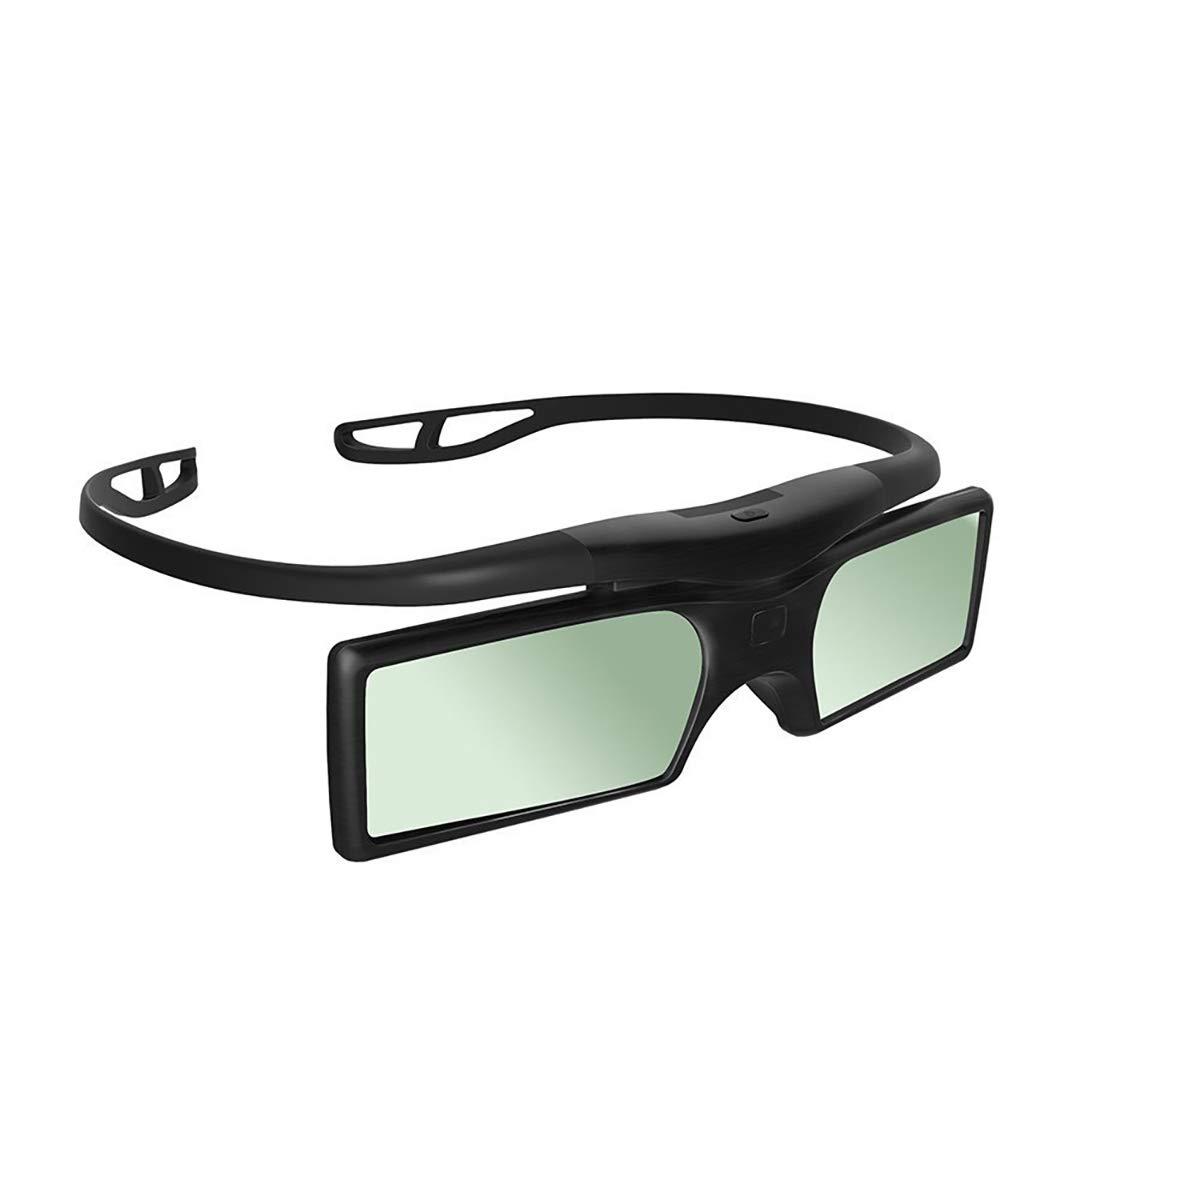 HarmonyHappy Gonbes G15-BT Bluetooth Gafas 3D estereoscópicas ...